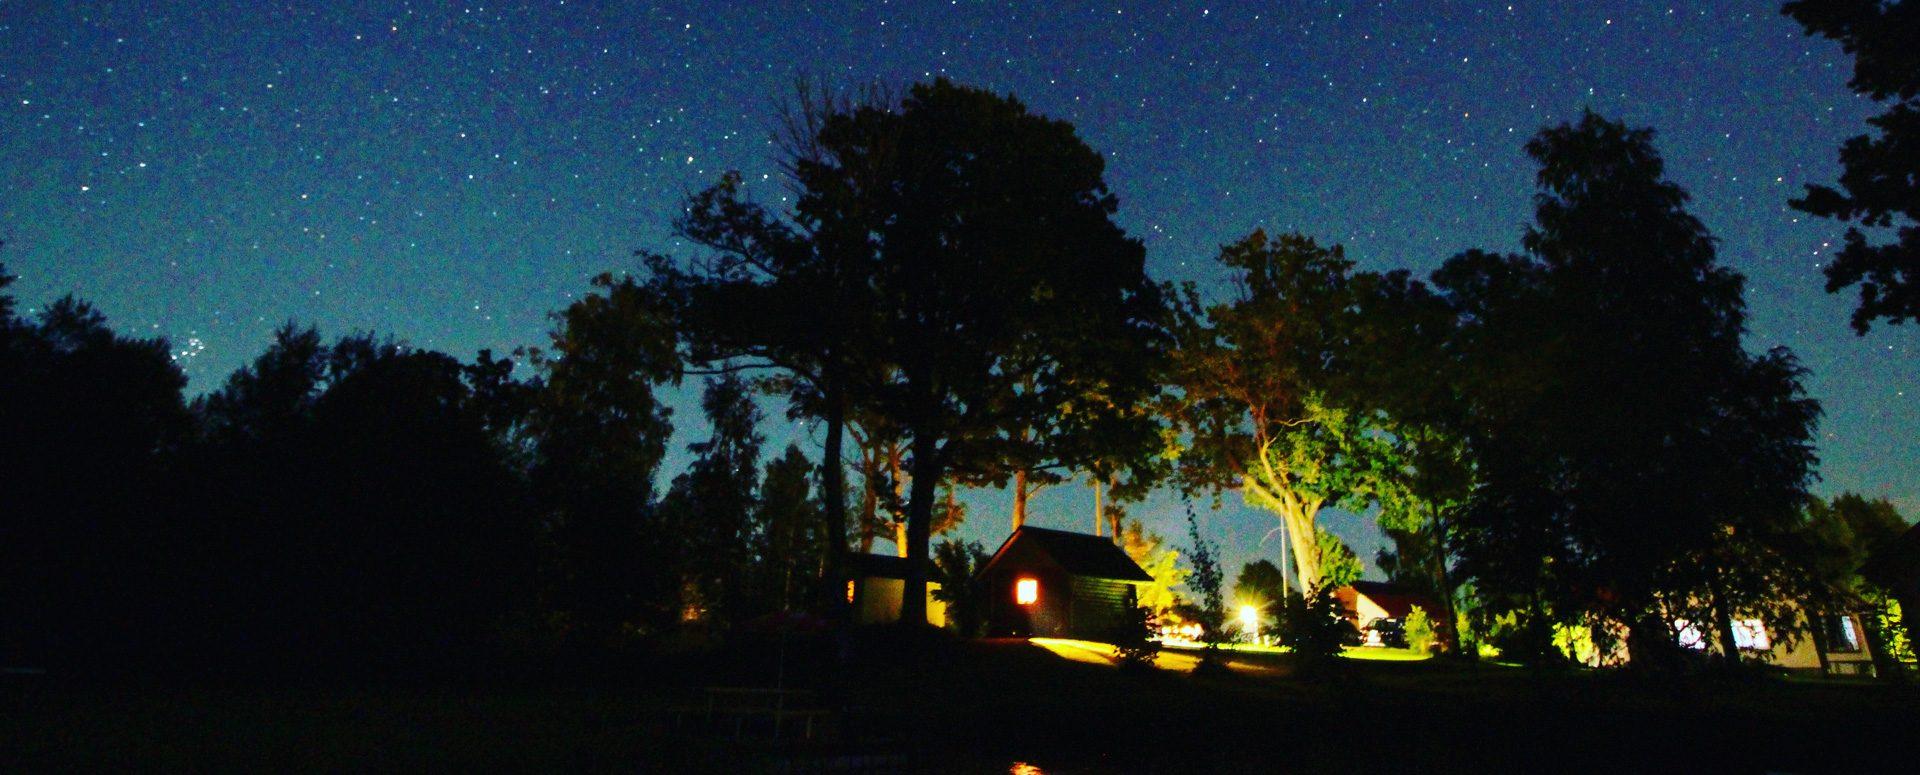 Roadtrip Estland Sternenhimmel Milchstraße